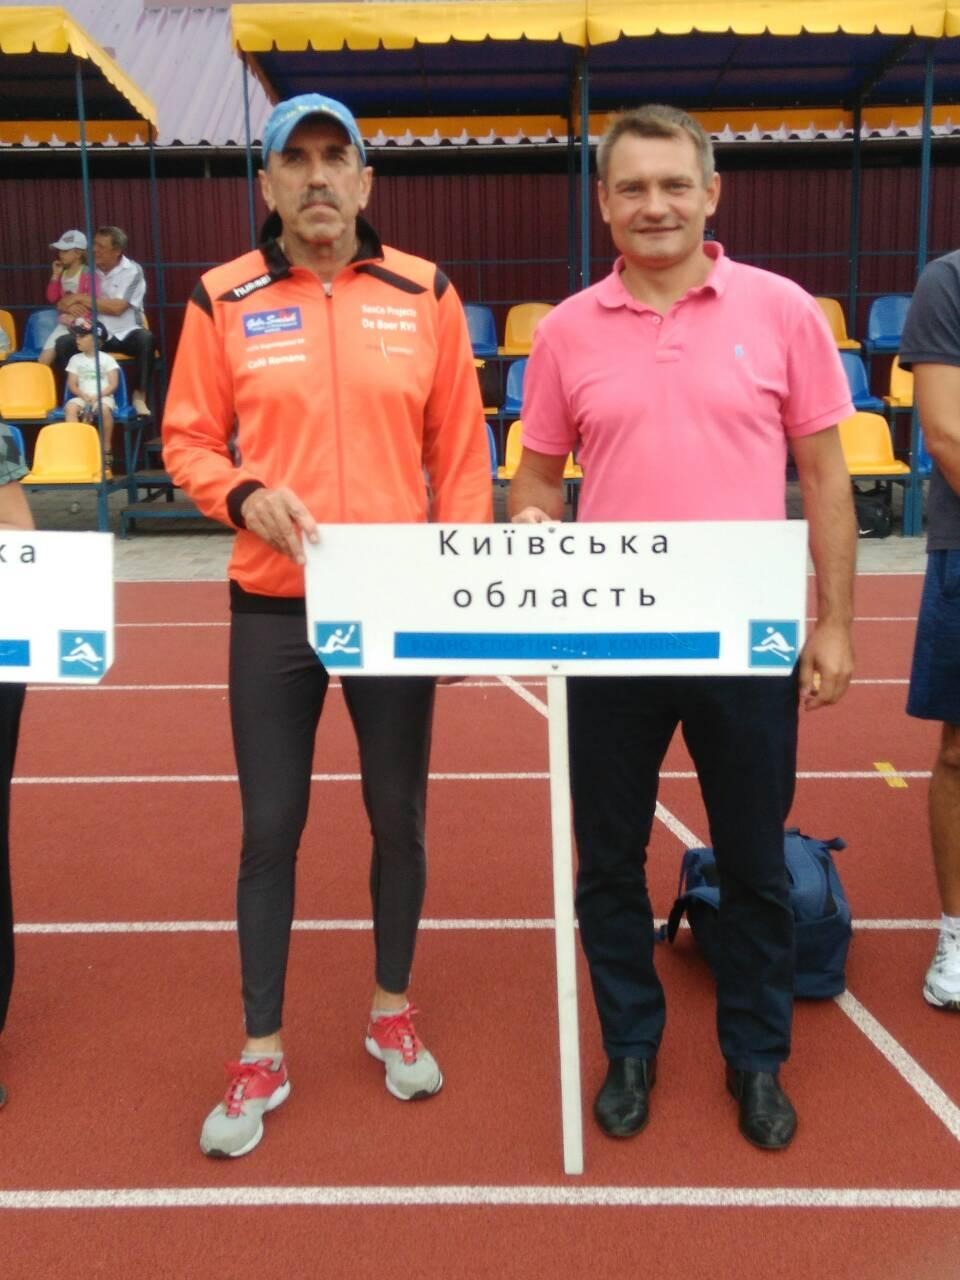 ЧУ з легкої атлетики, мастерс, Дніпро. Фото